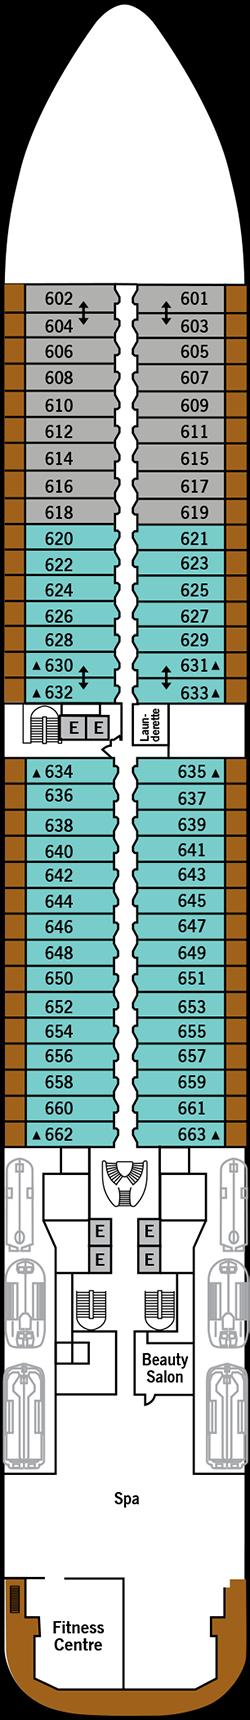 Silver Dawn Deck 6: Deck 6